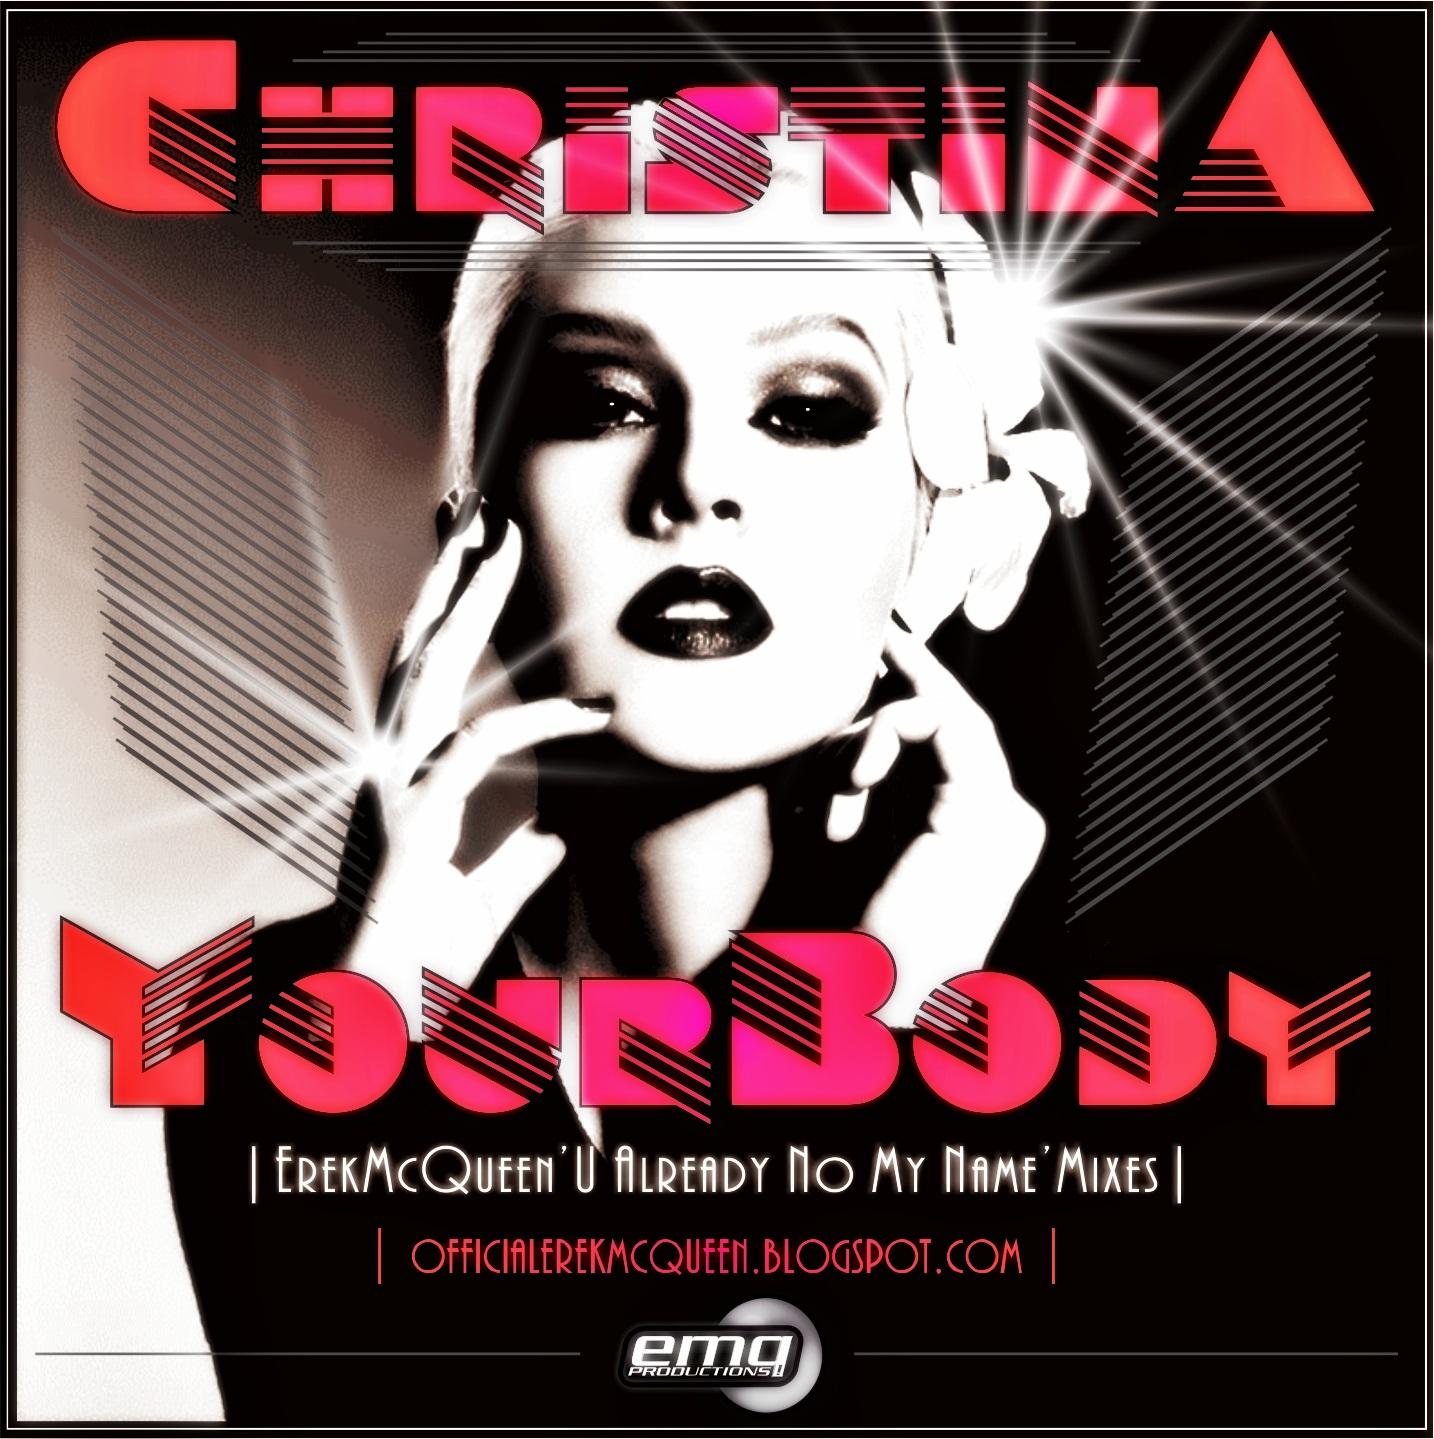 http://1.bp.blogspot.com/-CsZaMP2TF3Y/UNNwnQyJ_qI/AAAAAAAAASY/y4dbTc1kdGk/s1600/Christina+Aguilera+-+Your+Body+(ErekMcQueen+Mixes).jpg